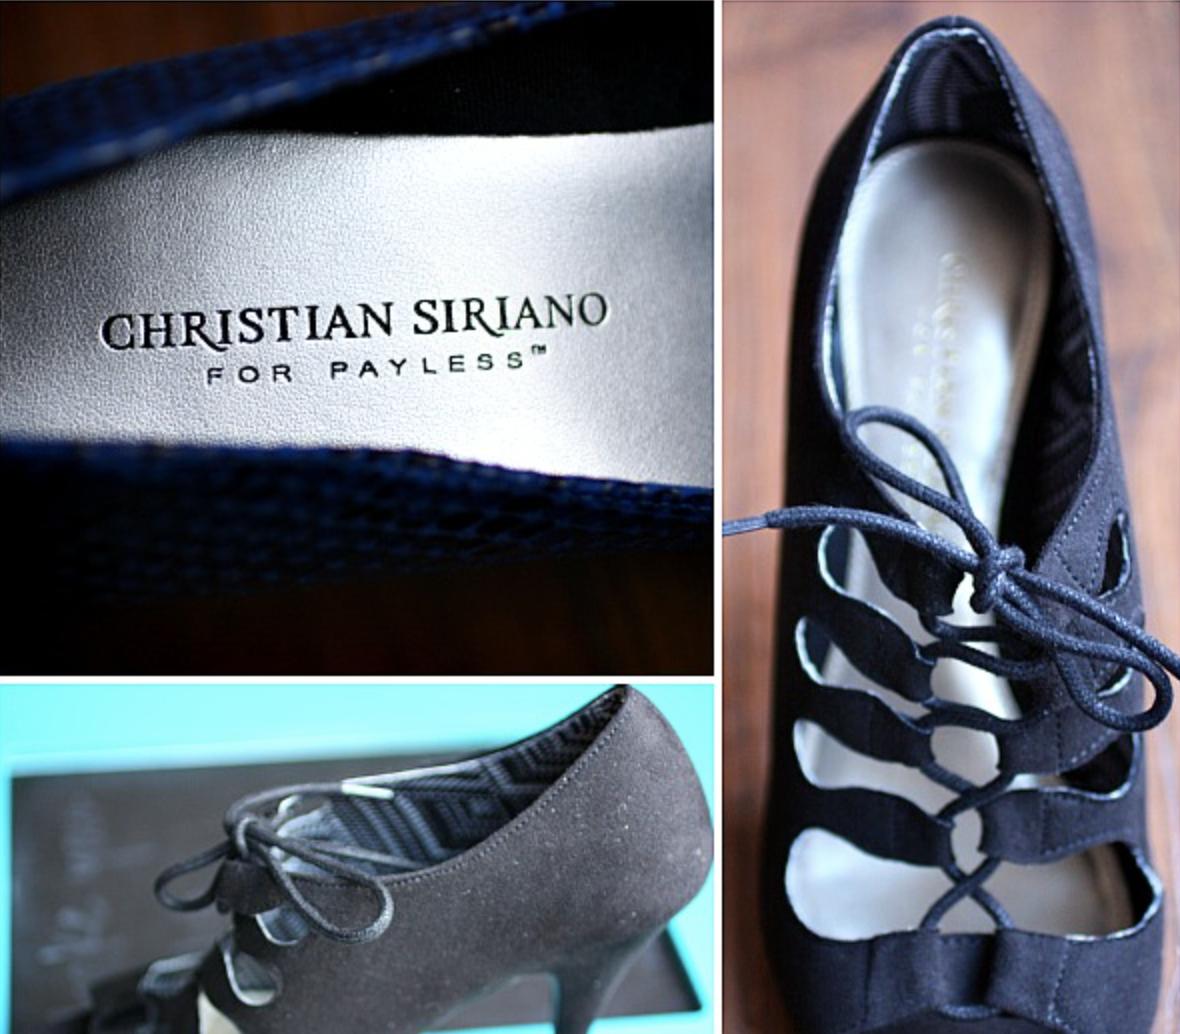 79ed34c5ed26 Christian Siriano Branding For Payless — rchrdsn